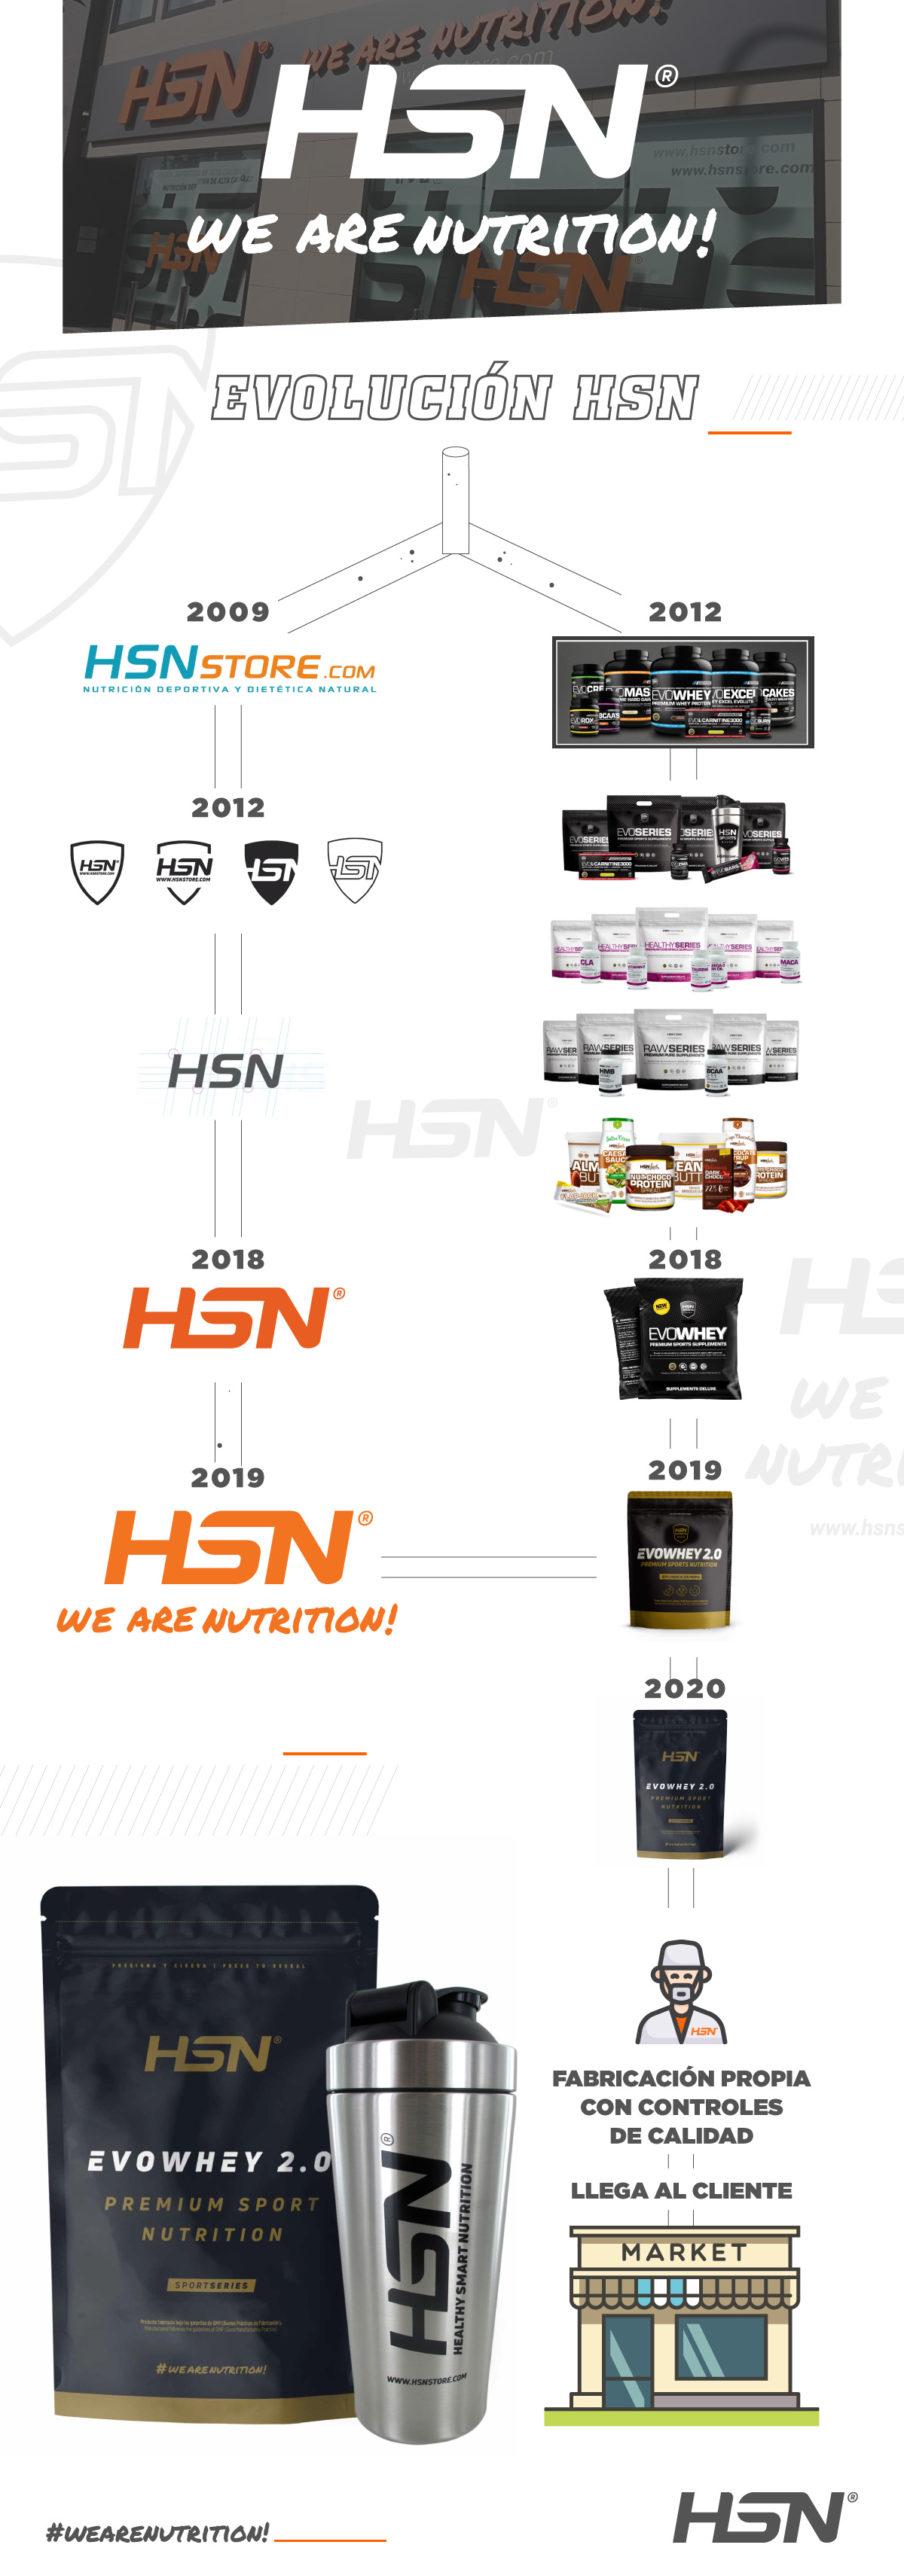 Evolution HSN